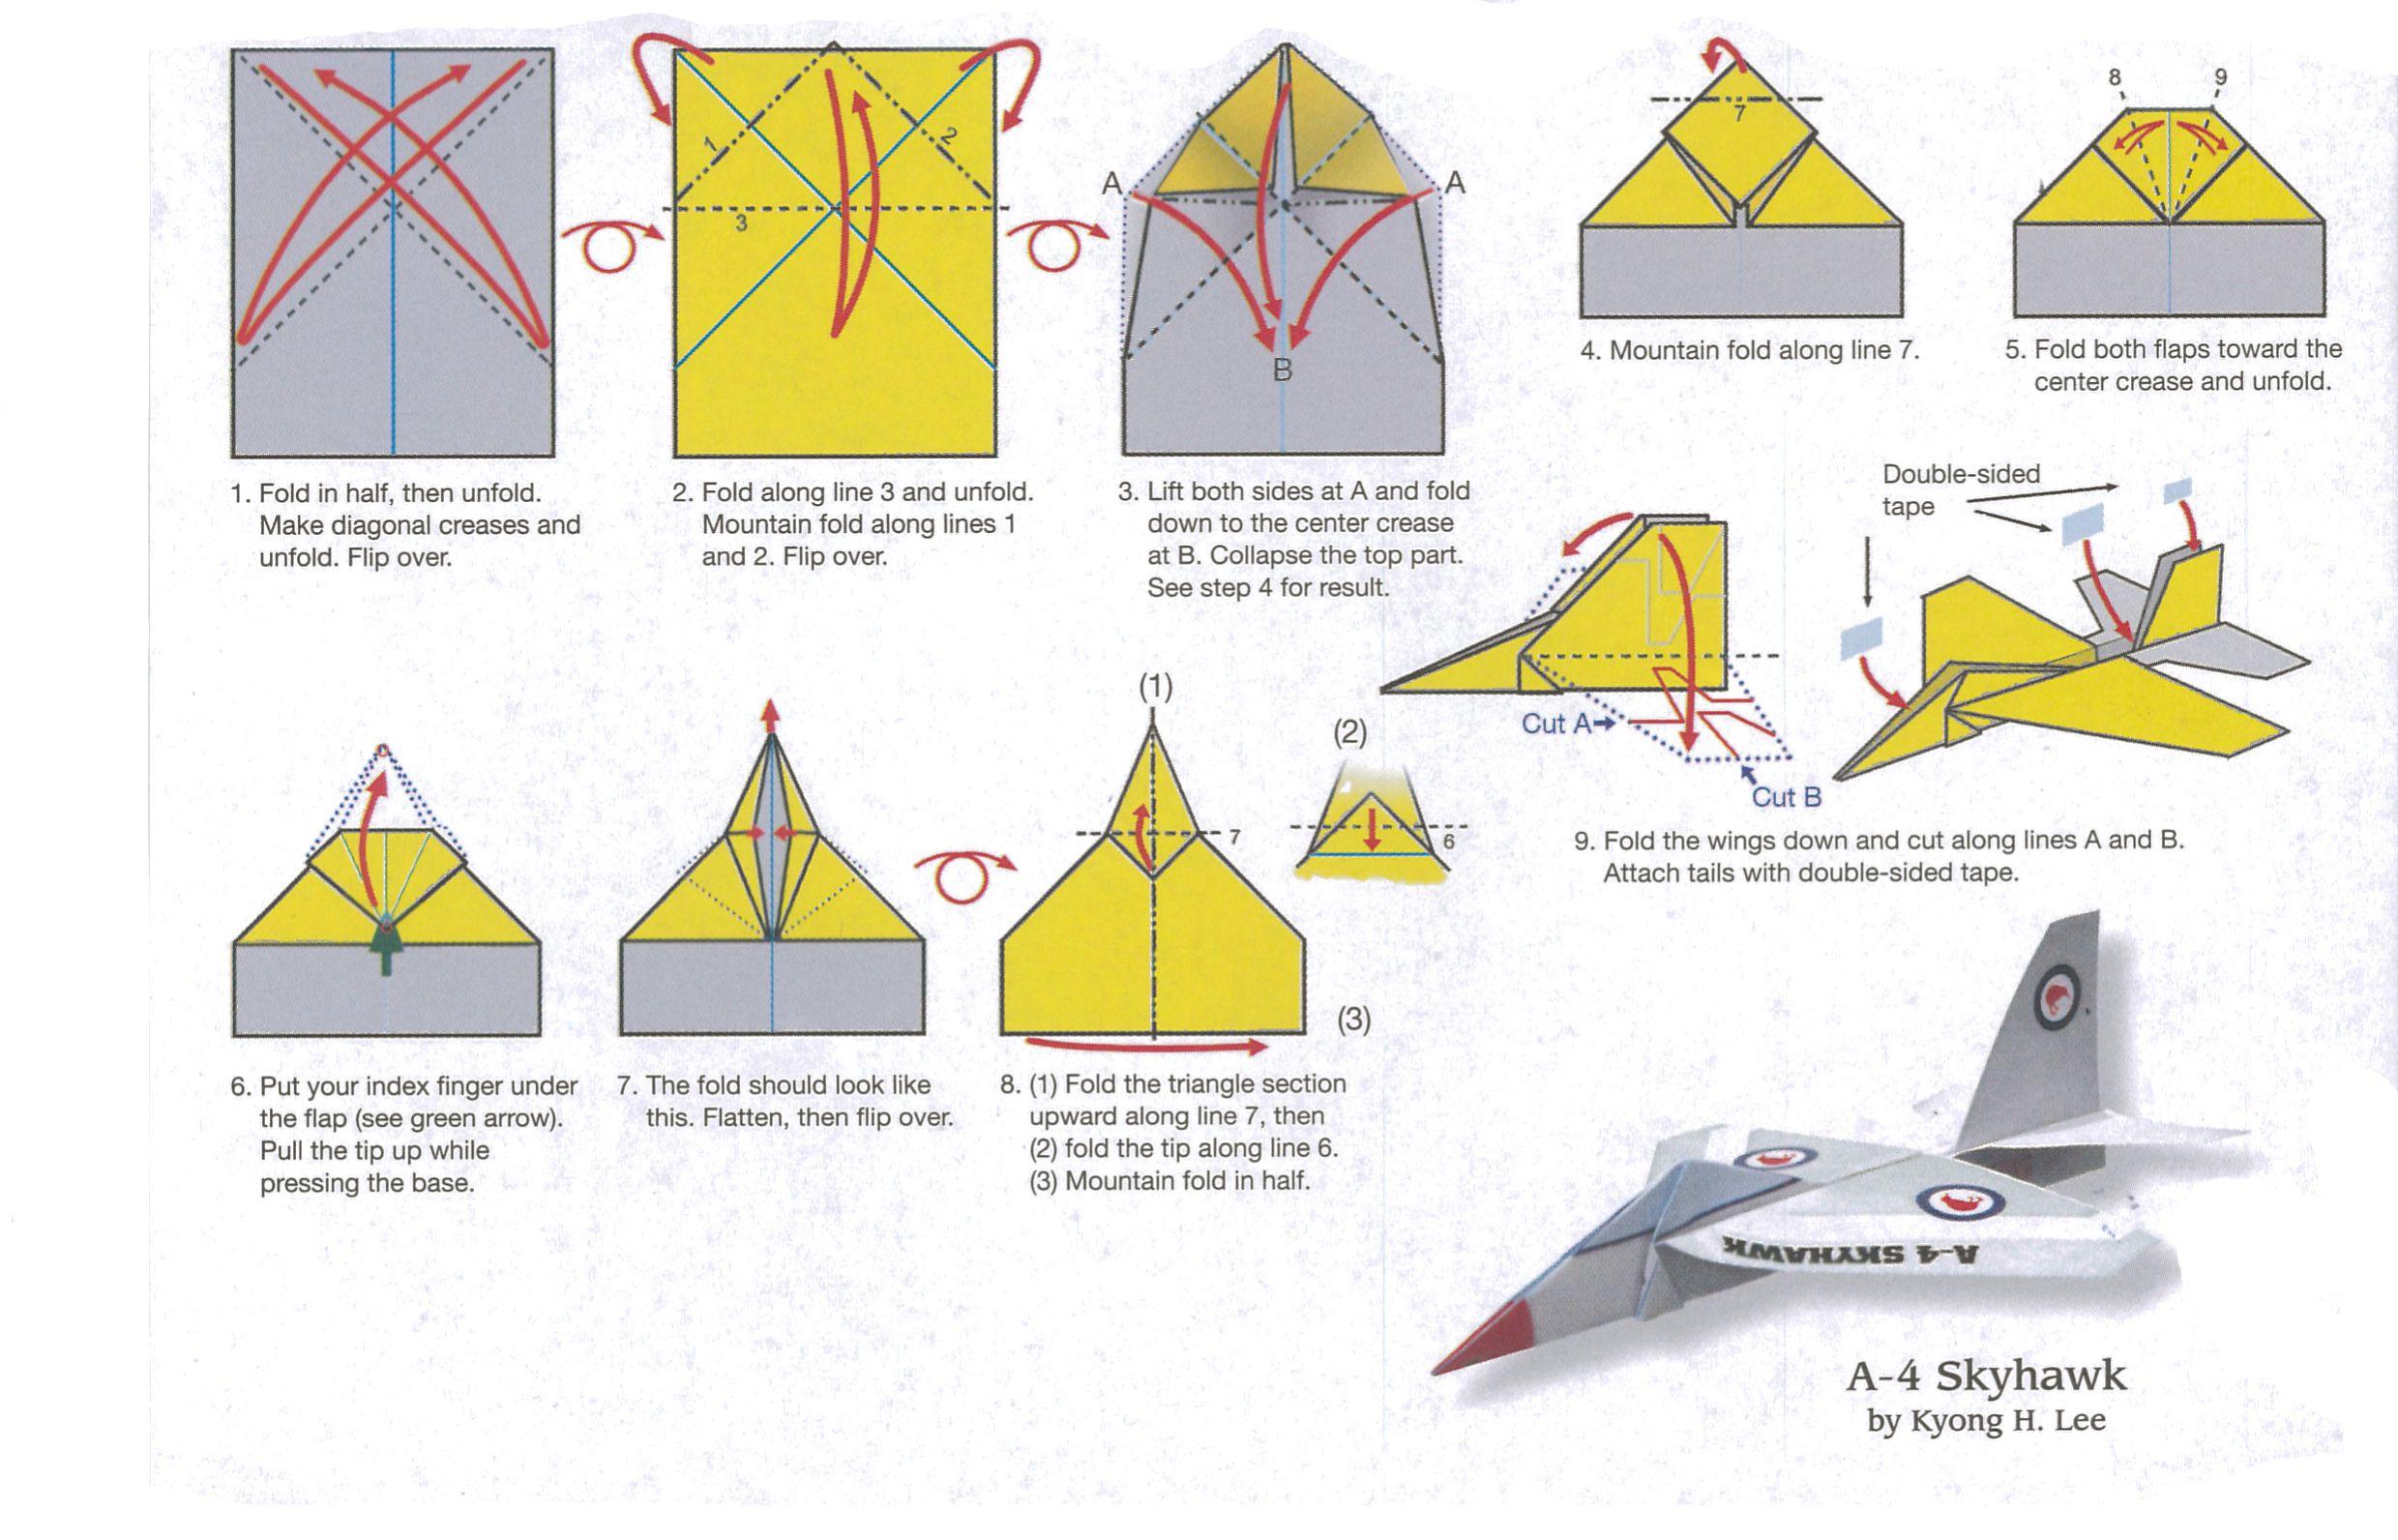 best paper plane folding instructions - Google keresés ... - photo#31